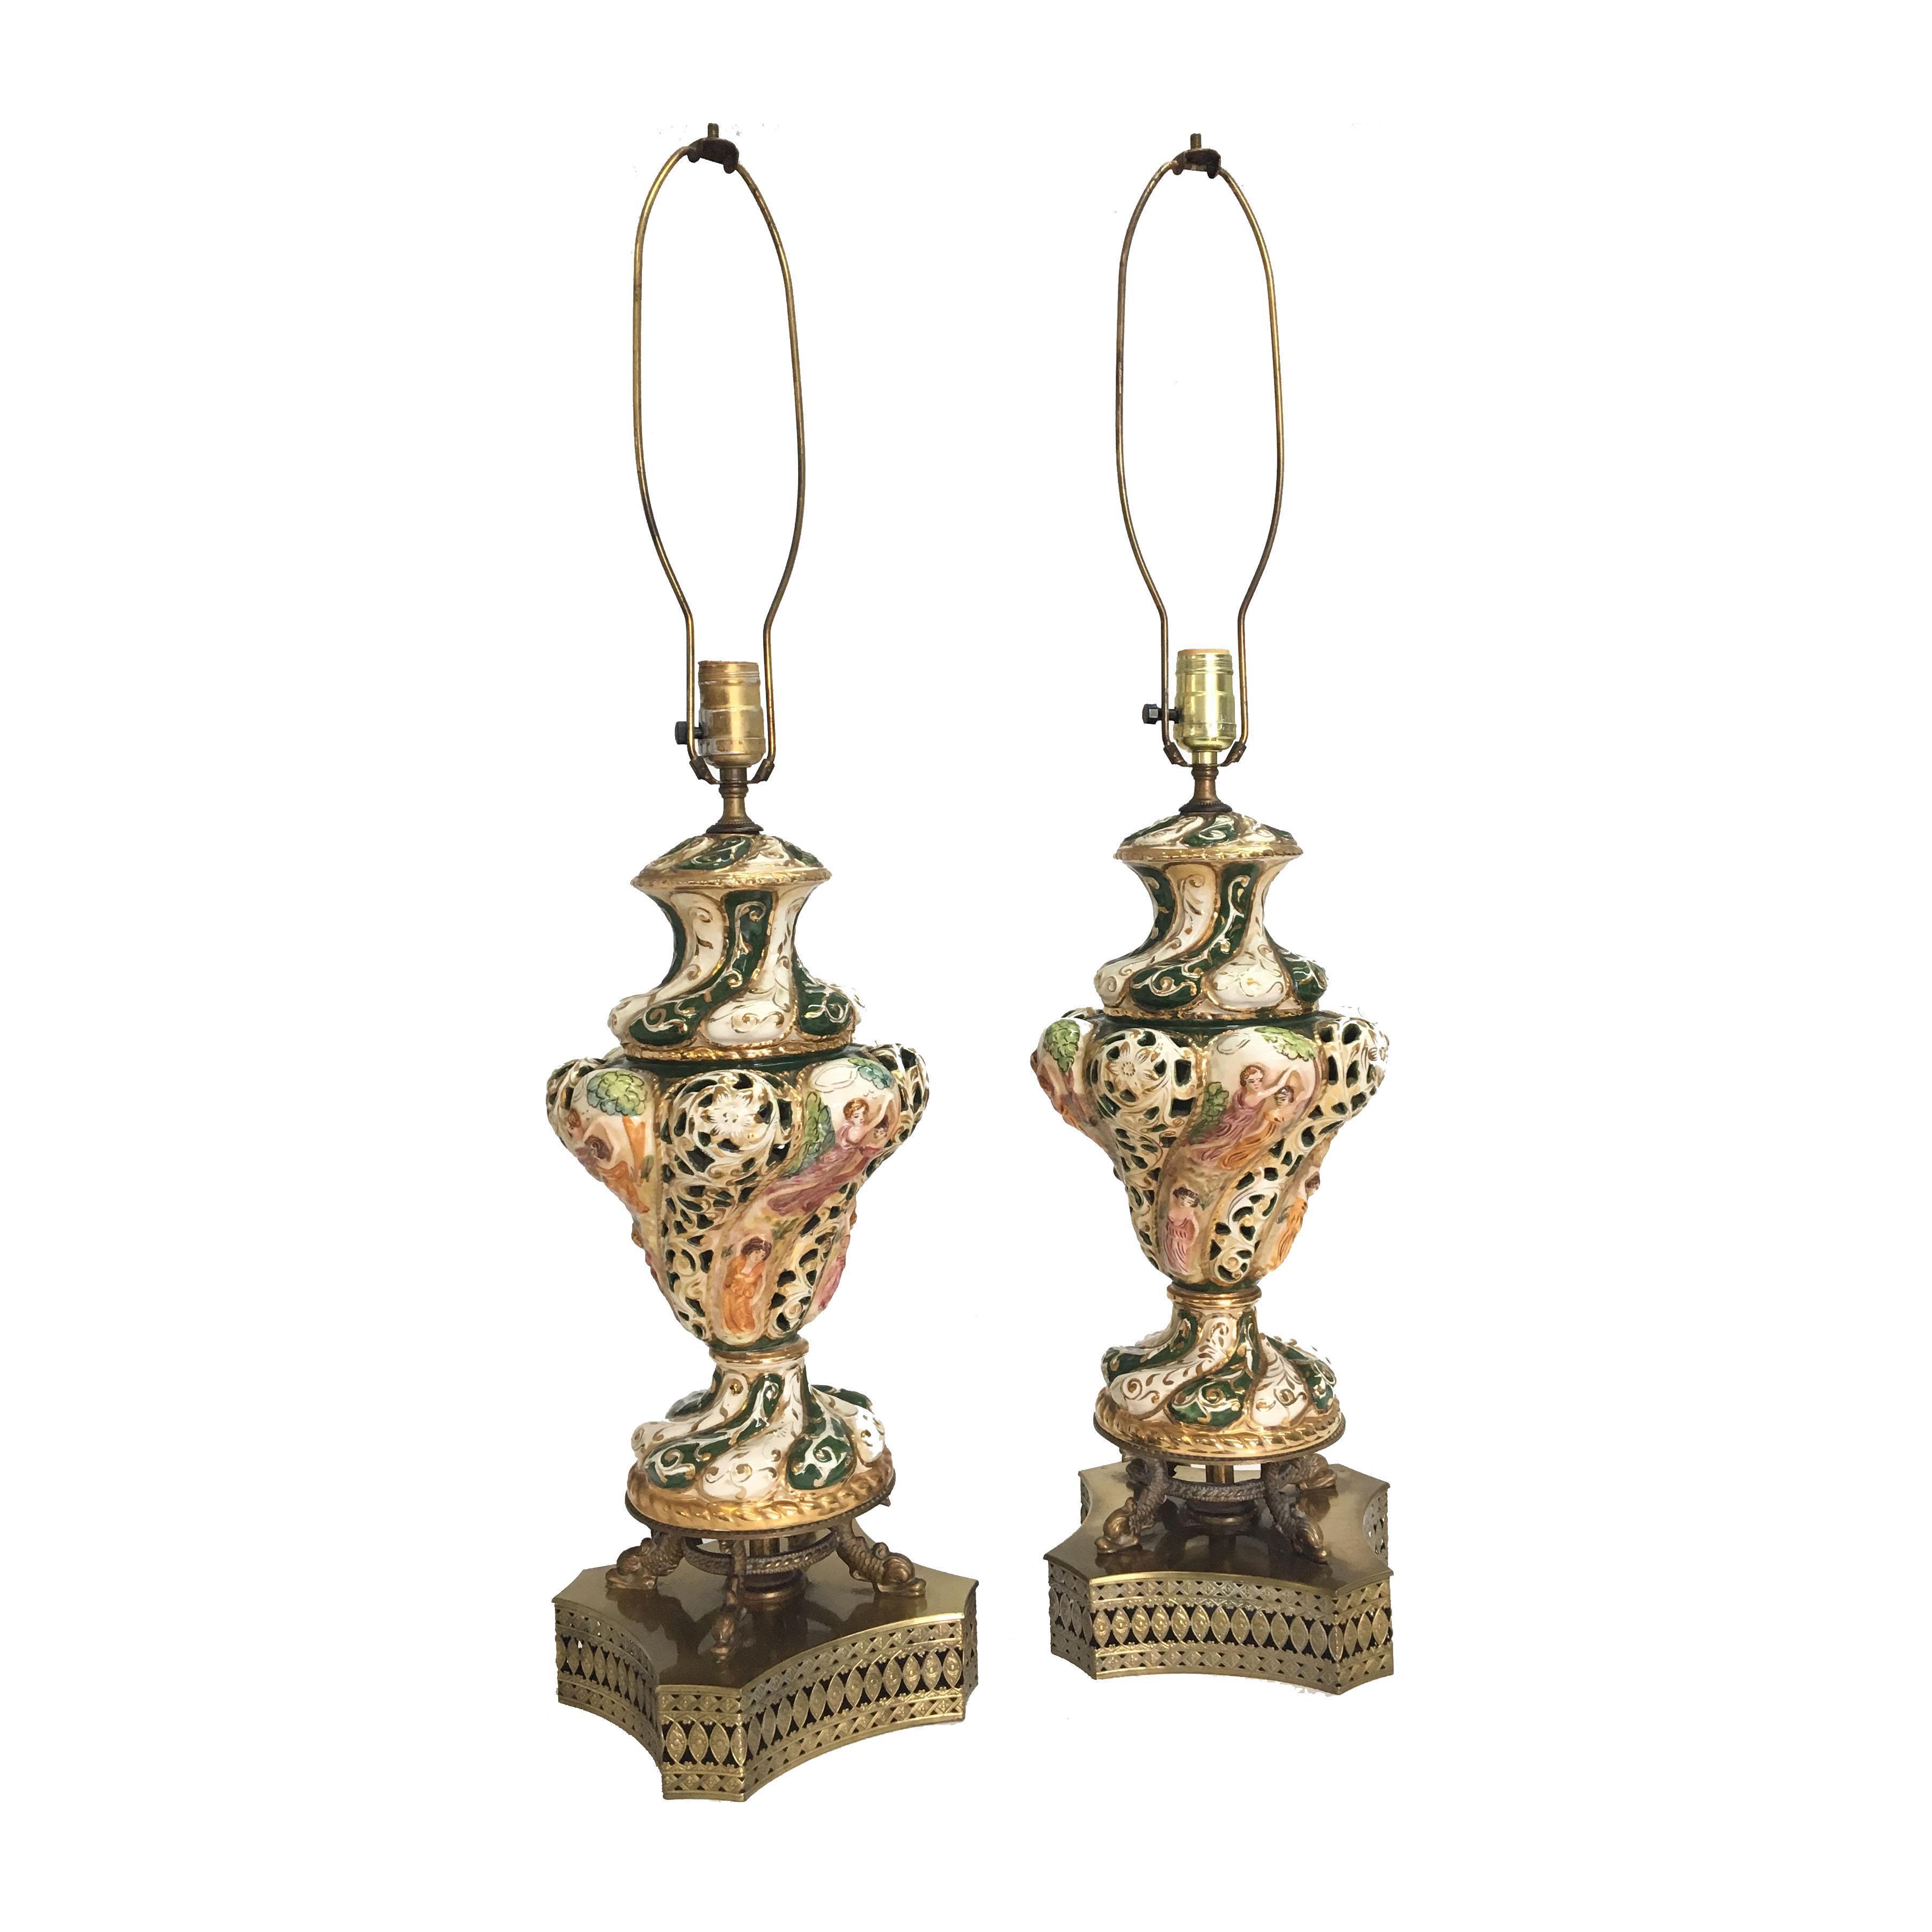 Antique Capodimonte Italian Porcelain Lamps A Pair